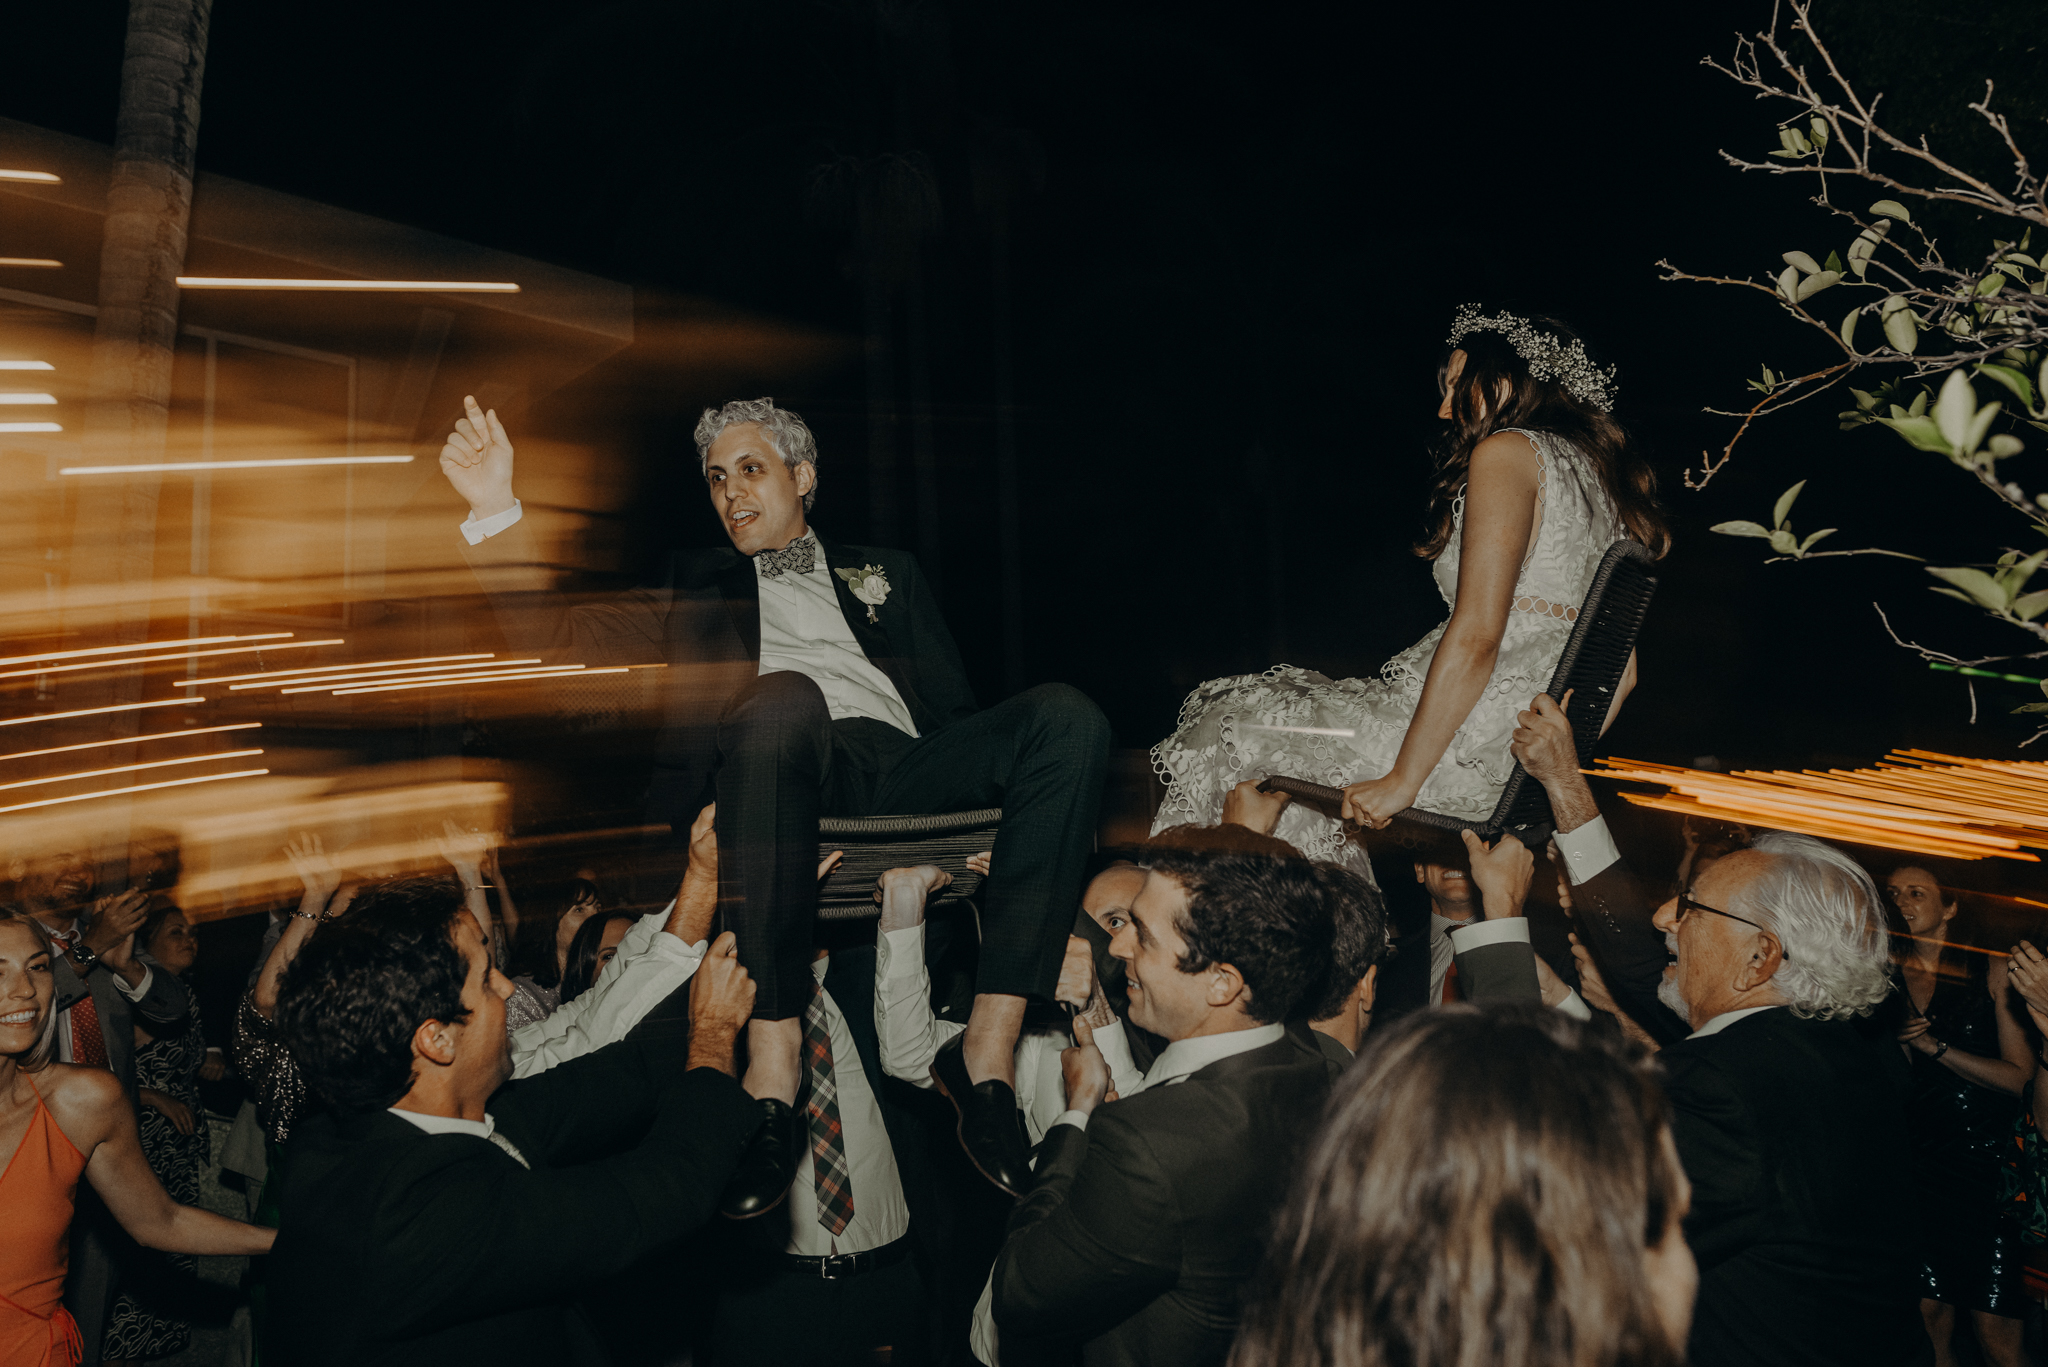 Isaiah + Taylor Photography - Private Estate Backyard Wedding - Beverly Hills - Los Angeles Wedding Photographer - 144.jpg